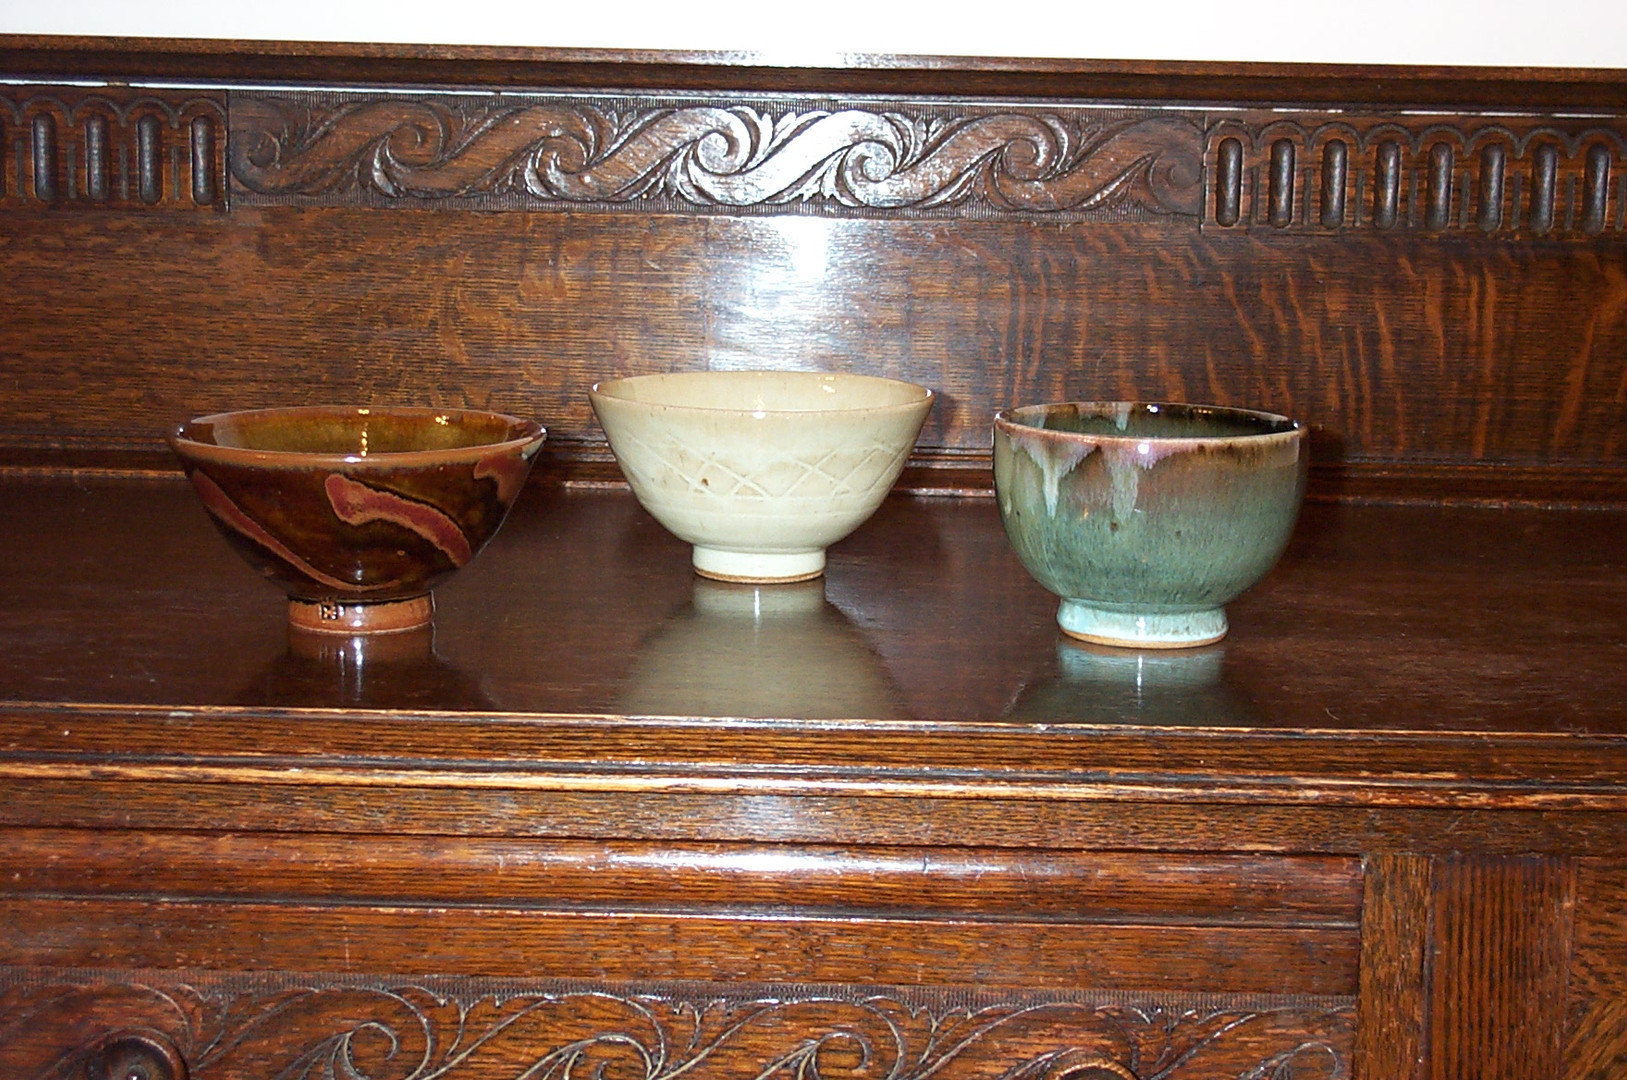 045-047  tea bowls.jpg